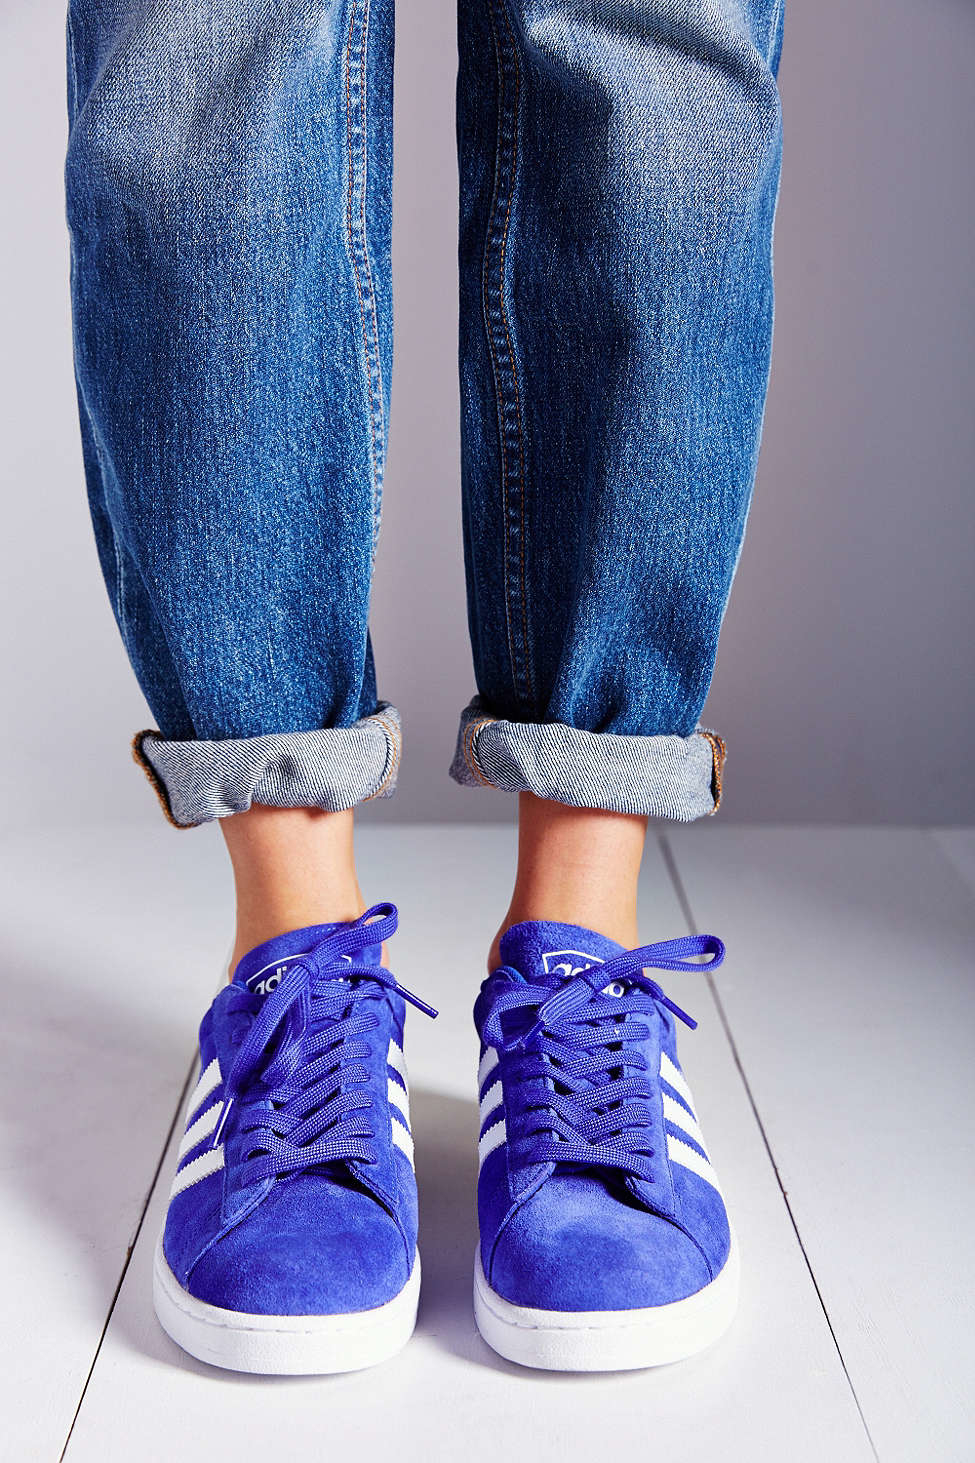 Lyst - adidas Originals Campus 2 Suede Sneaker in Blue 302adc4b40